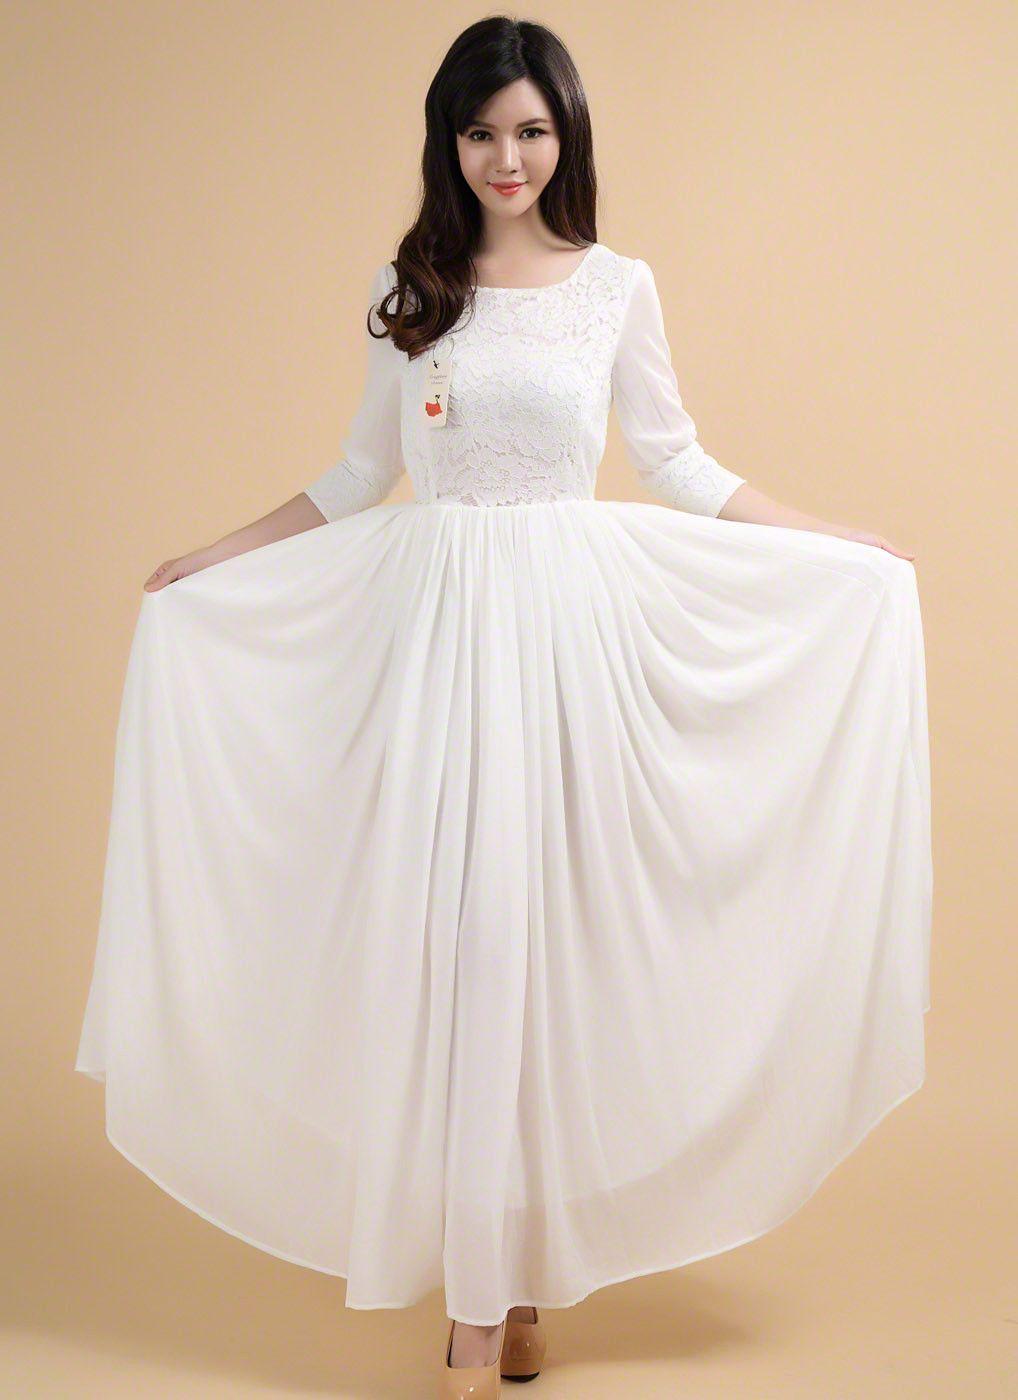 Vintage style white maxi length chiffon wedding dress with lace